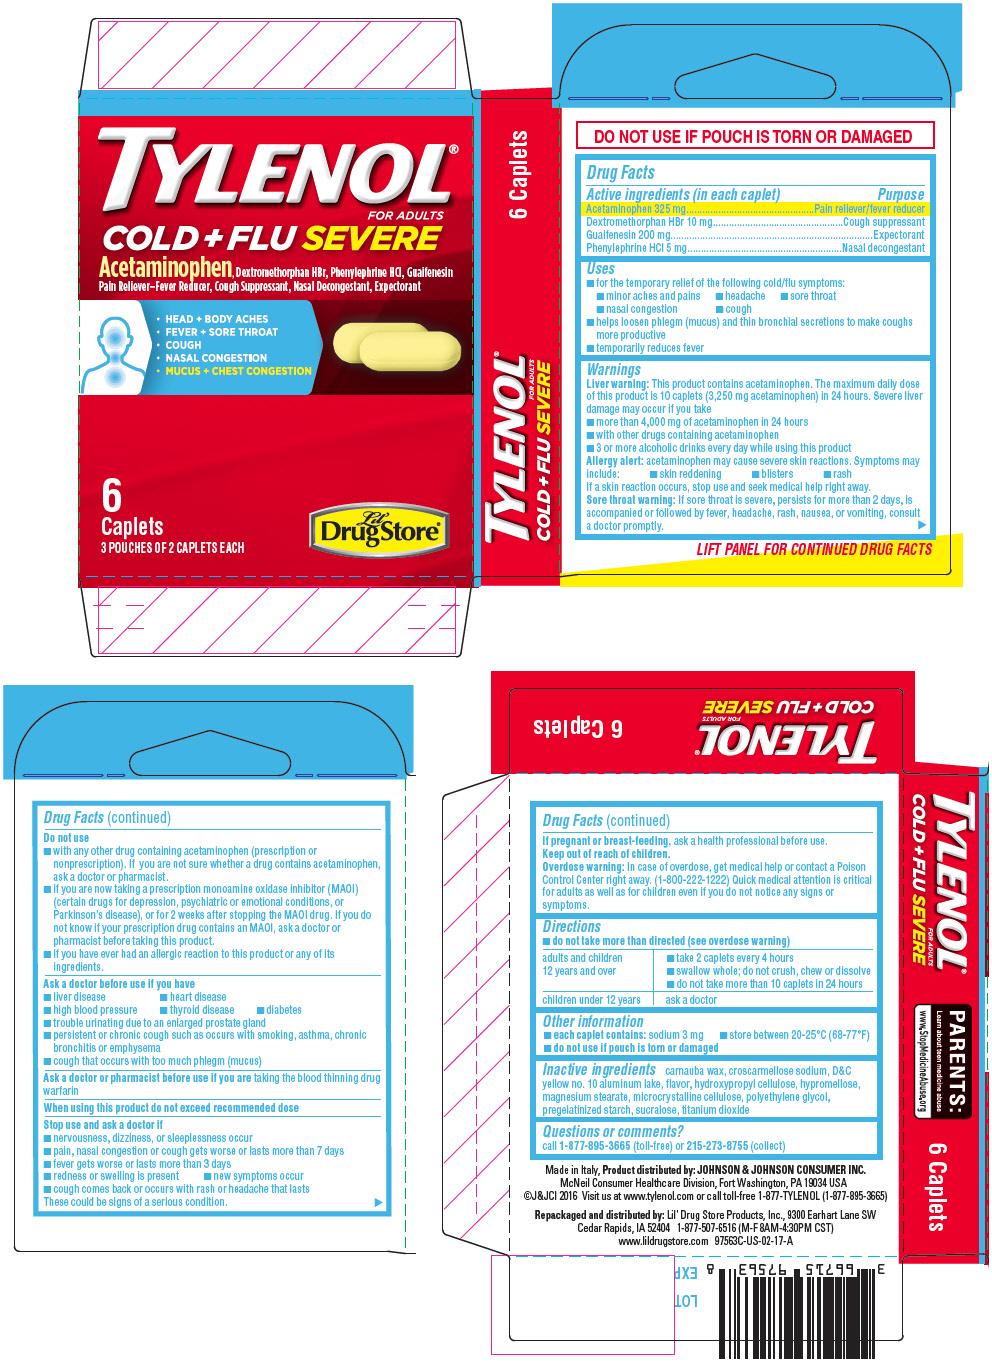 Acetaminophen, Dextromethorphan Hydrobromide, Guaifenesin, and Phenylephrine Hydrochloride (Lil Drug Store Tylenol Cold plus Flu Severe)